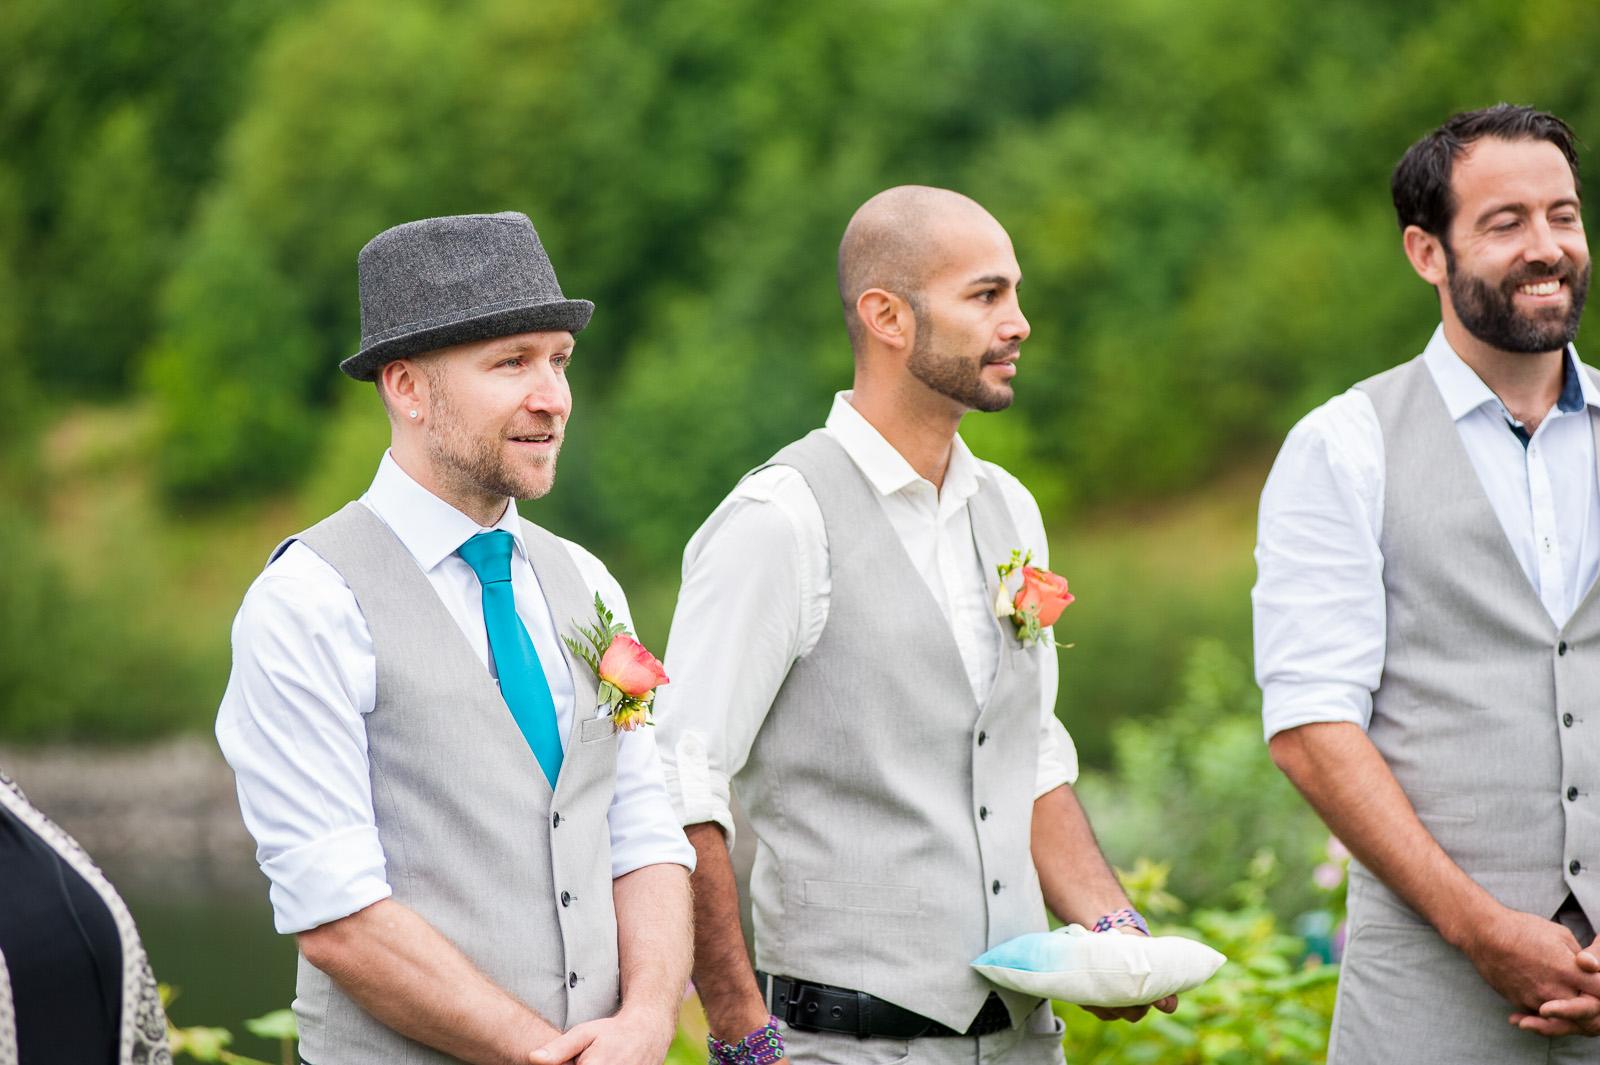 bc-wedding-photographers-cleveland-dam-wedding-05.jpg